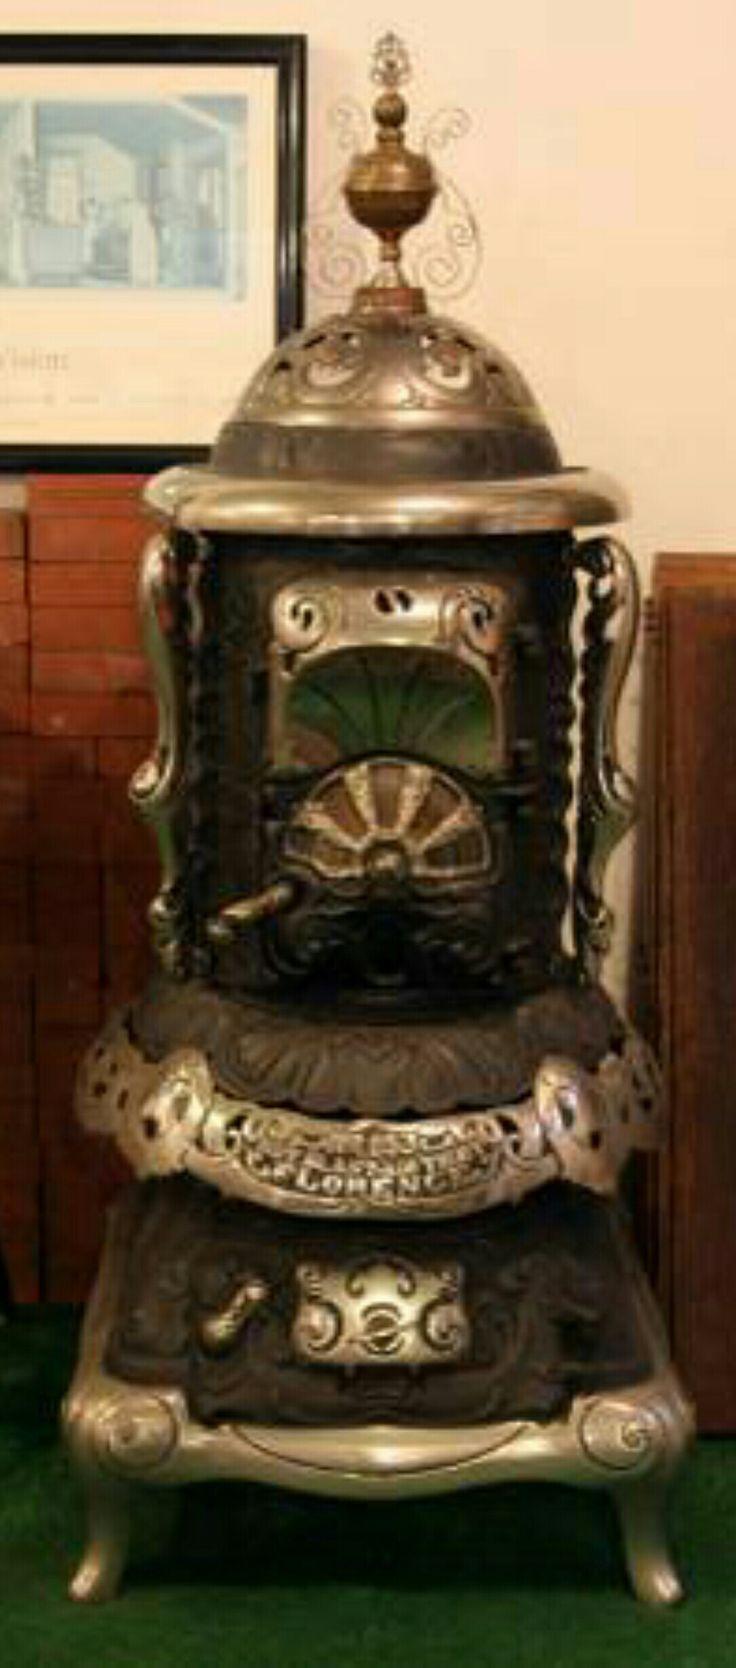 12 best barrel stove images on pinterest wood stoves 55 gallon